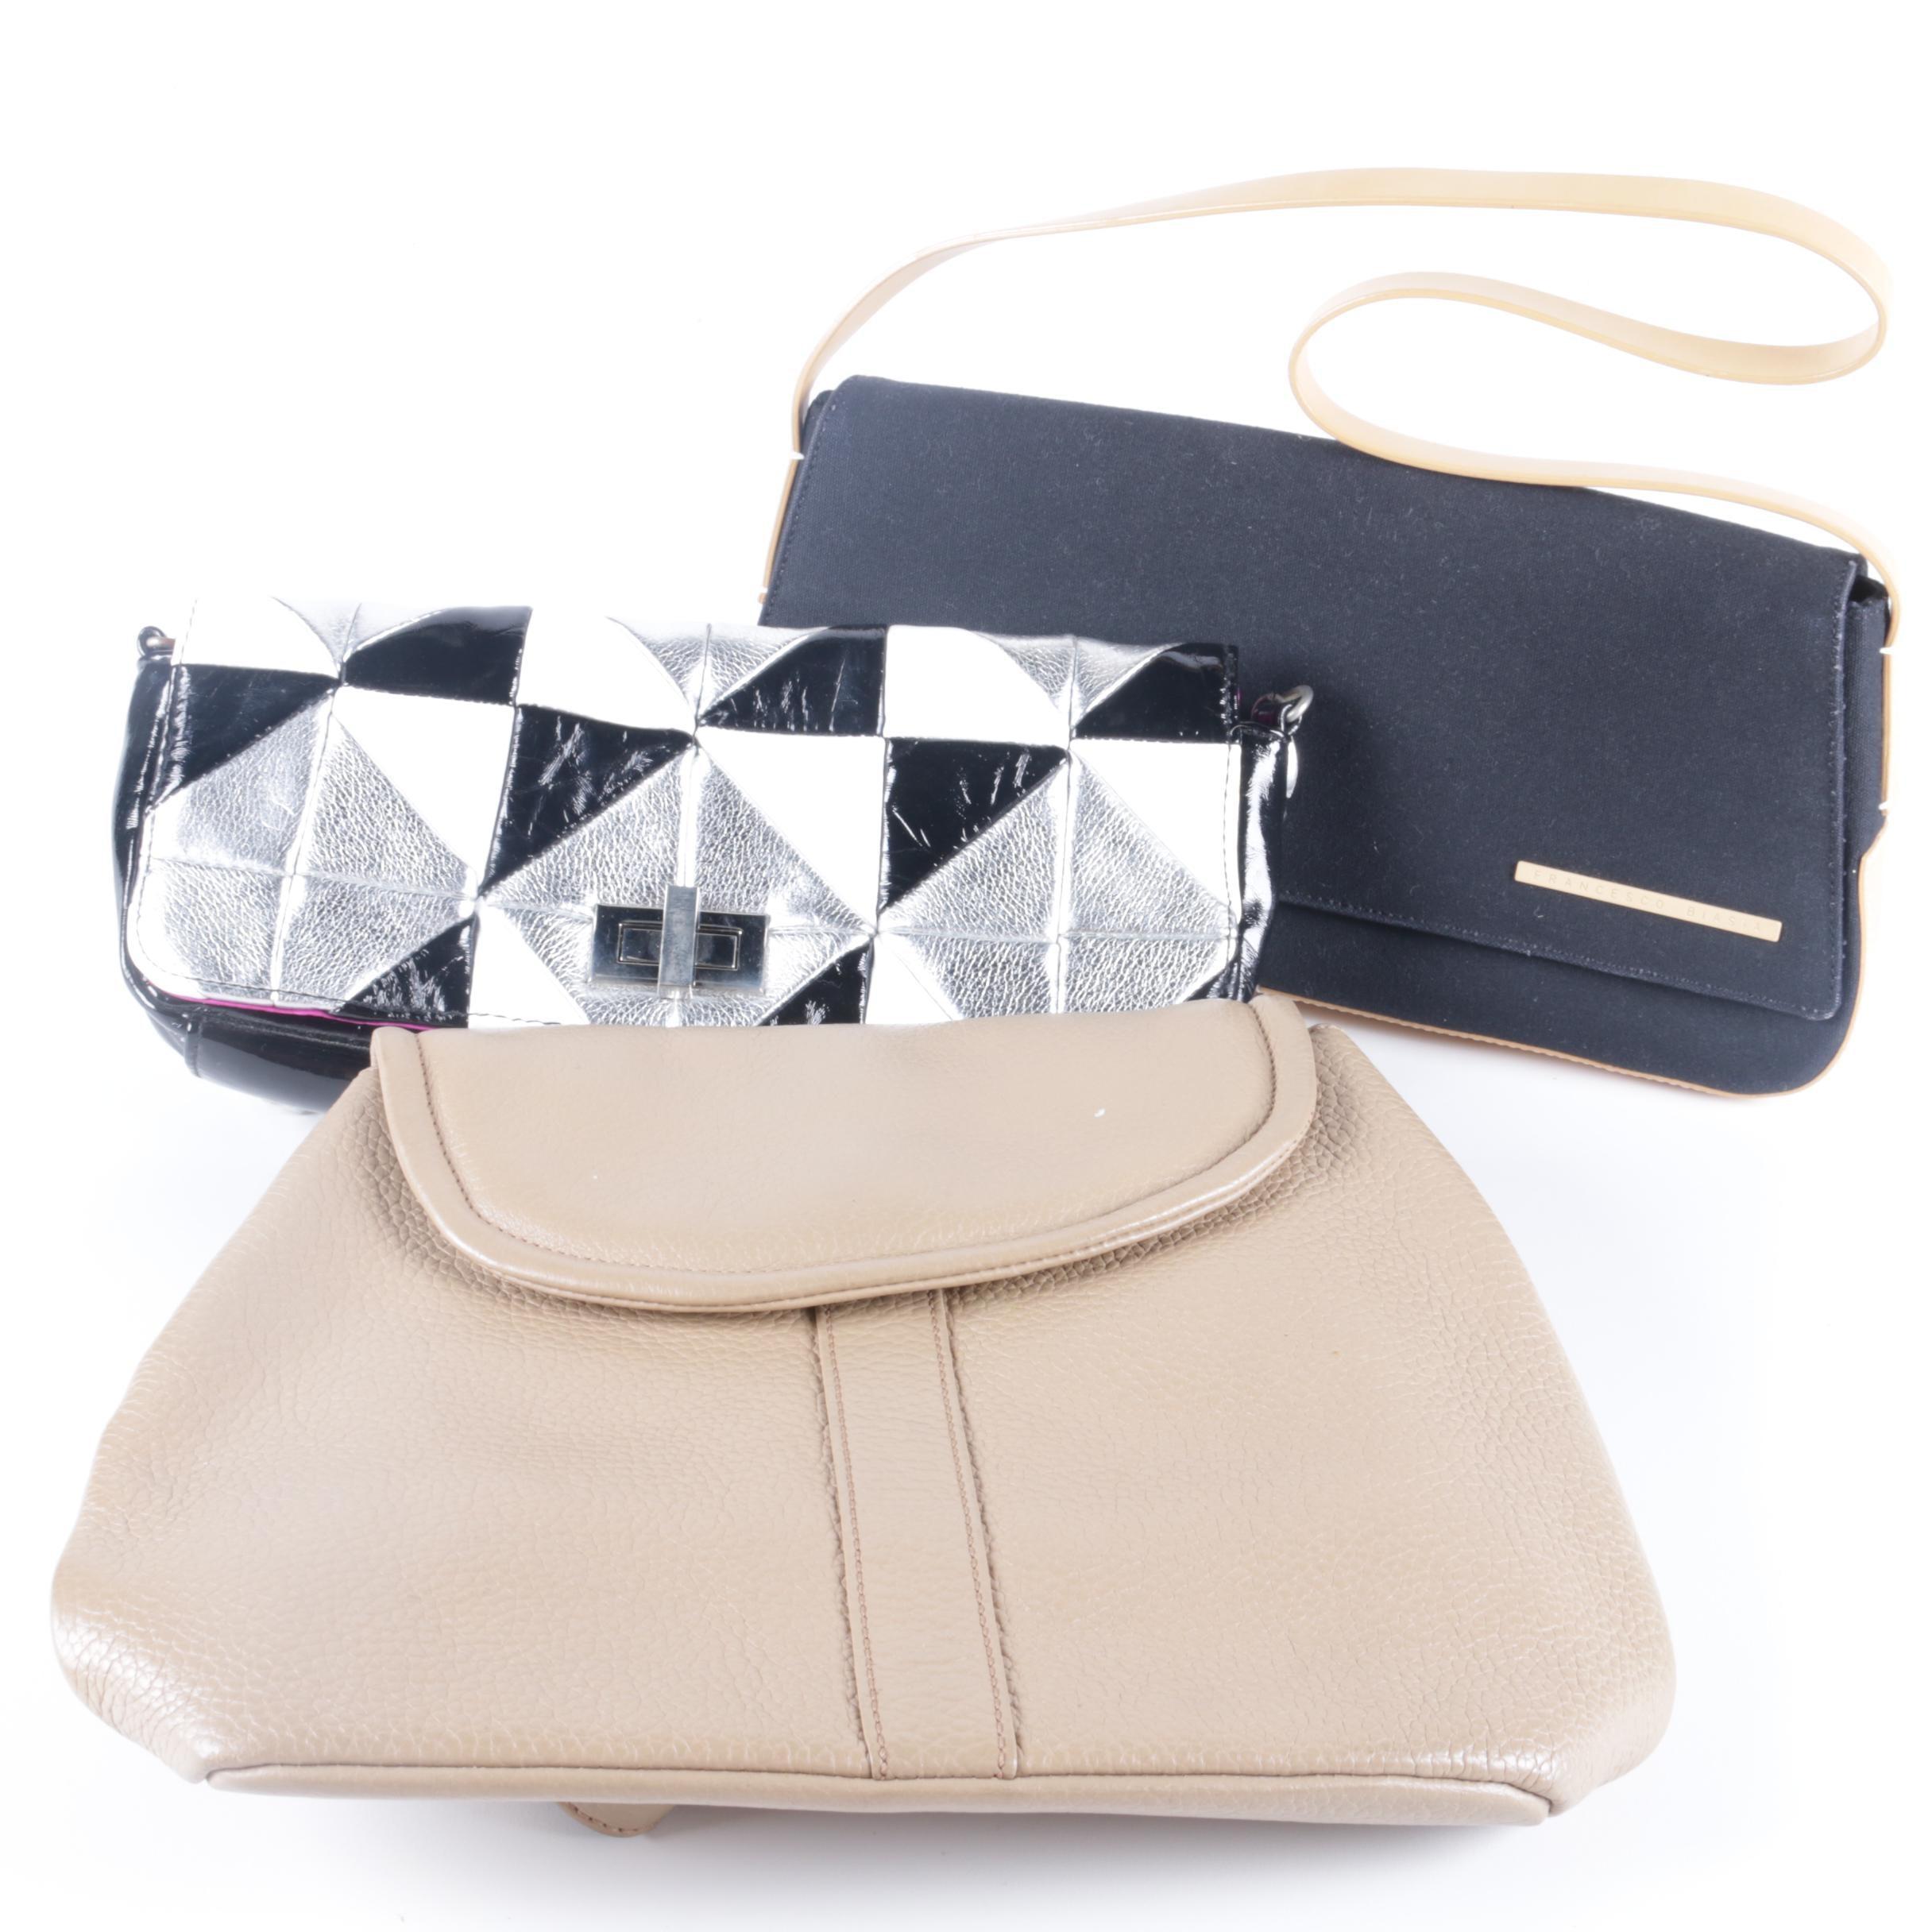 Handbags Including Francesco Biasia and Steve Madden